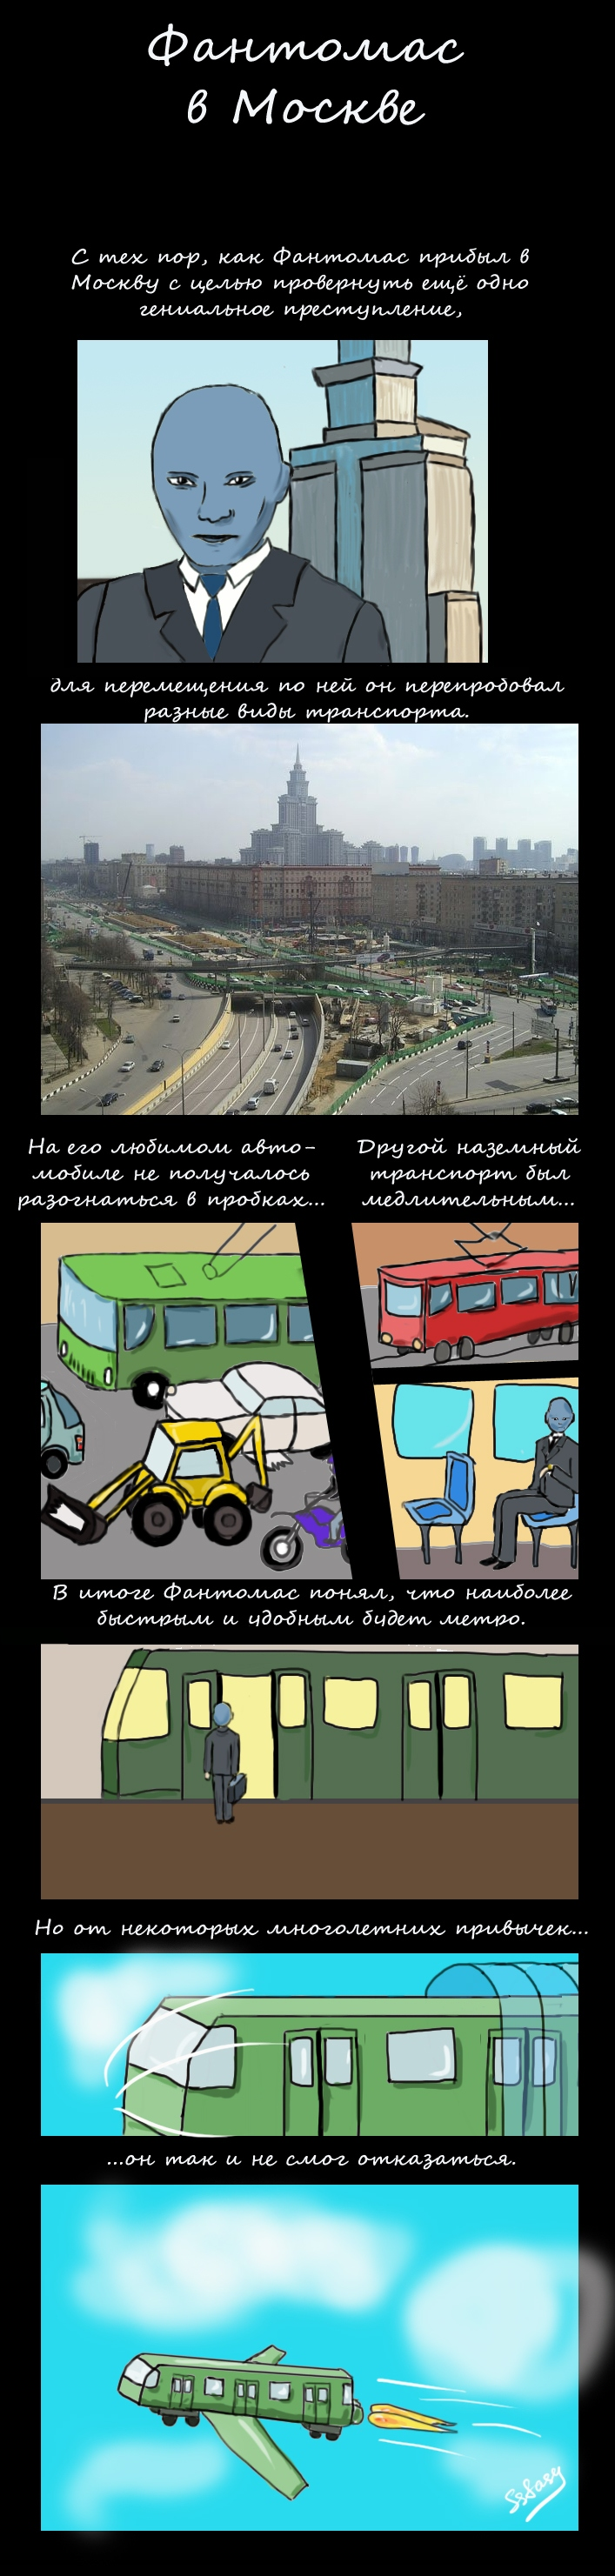 Комикс битва №16 выпуск 109